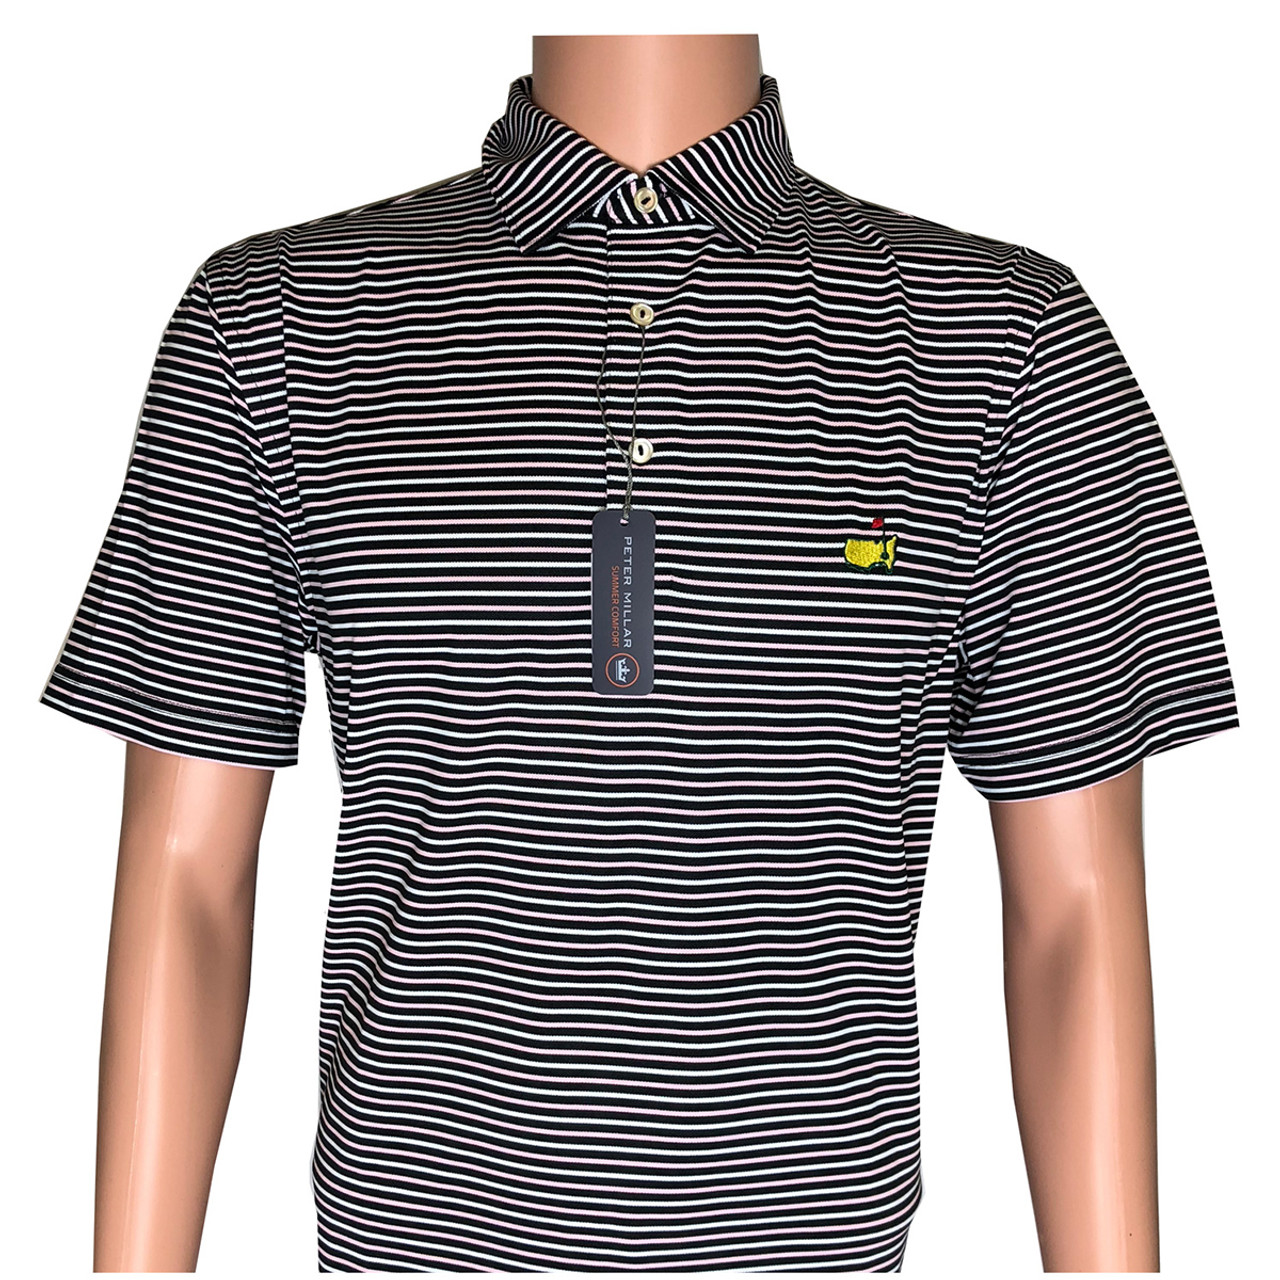 06b6a5d9 Masters Peter Millar Black, White and Pink Striped Tech Golf Shirt